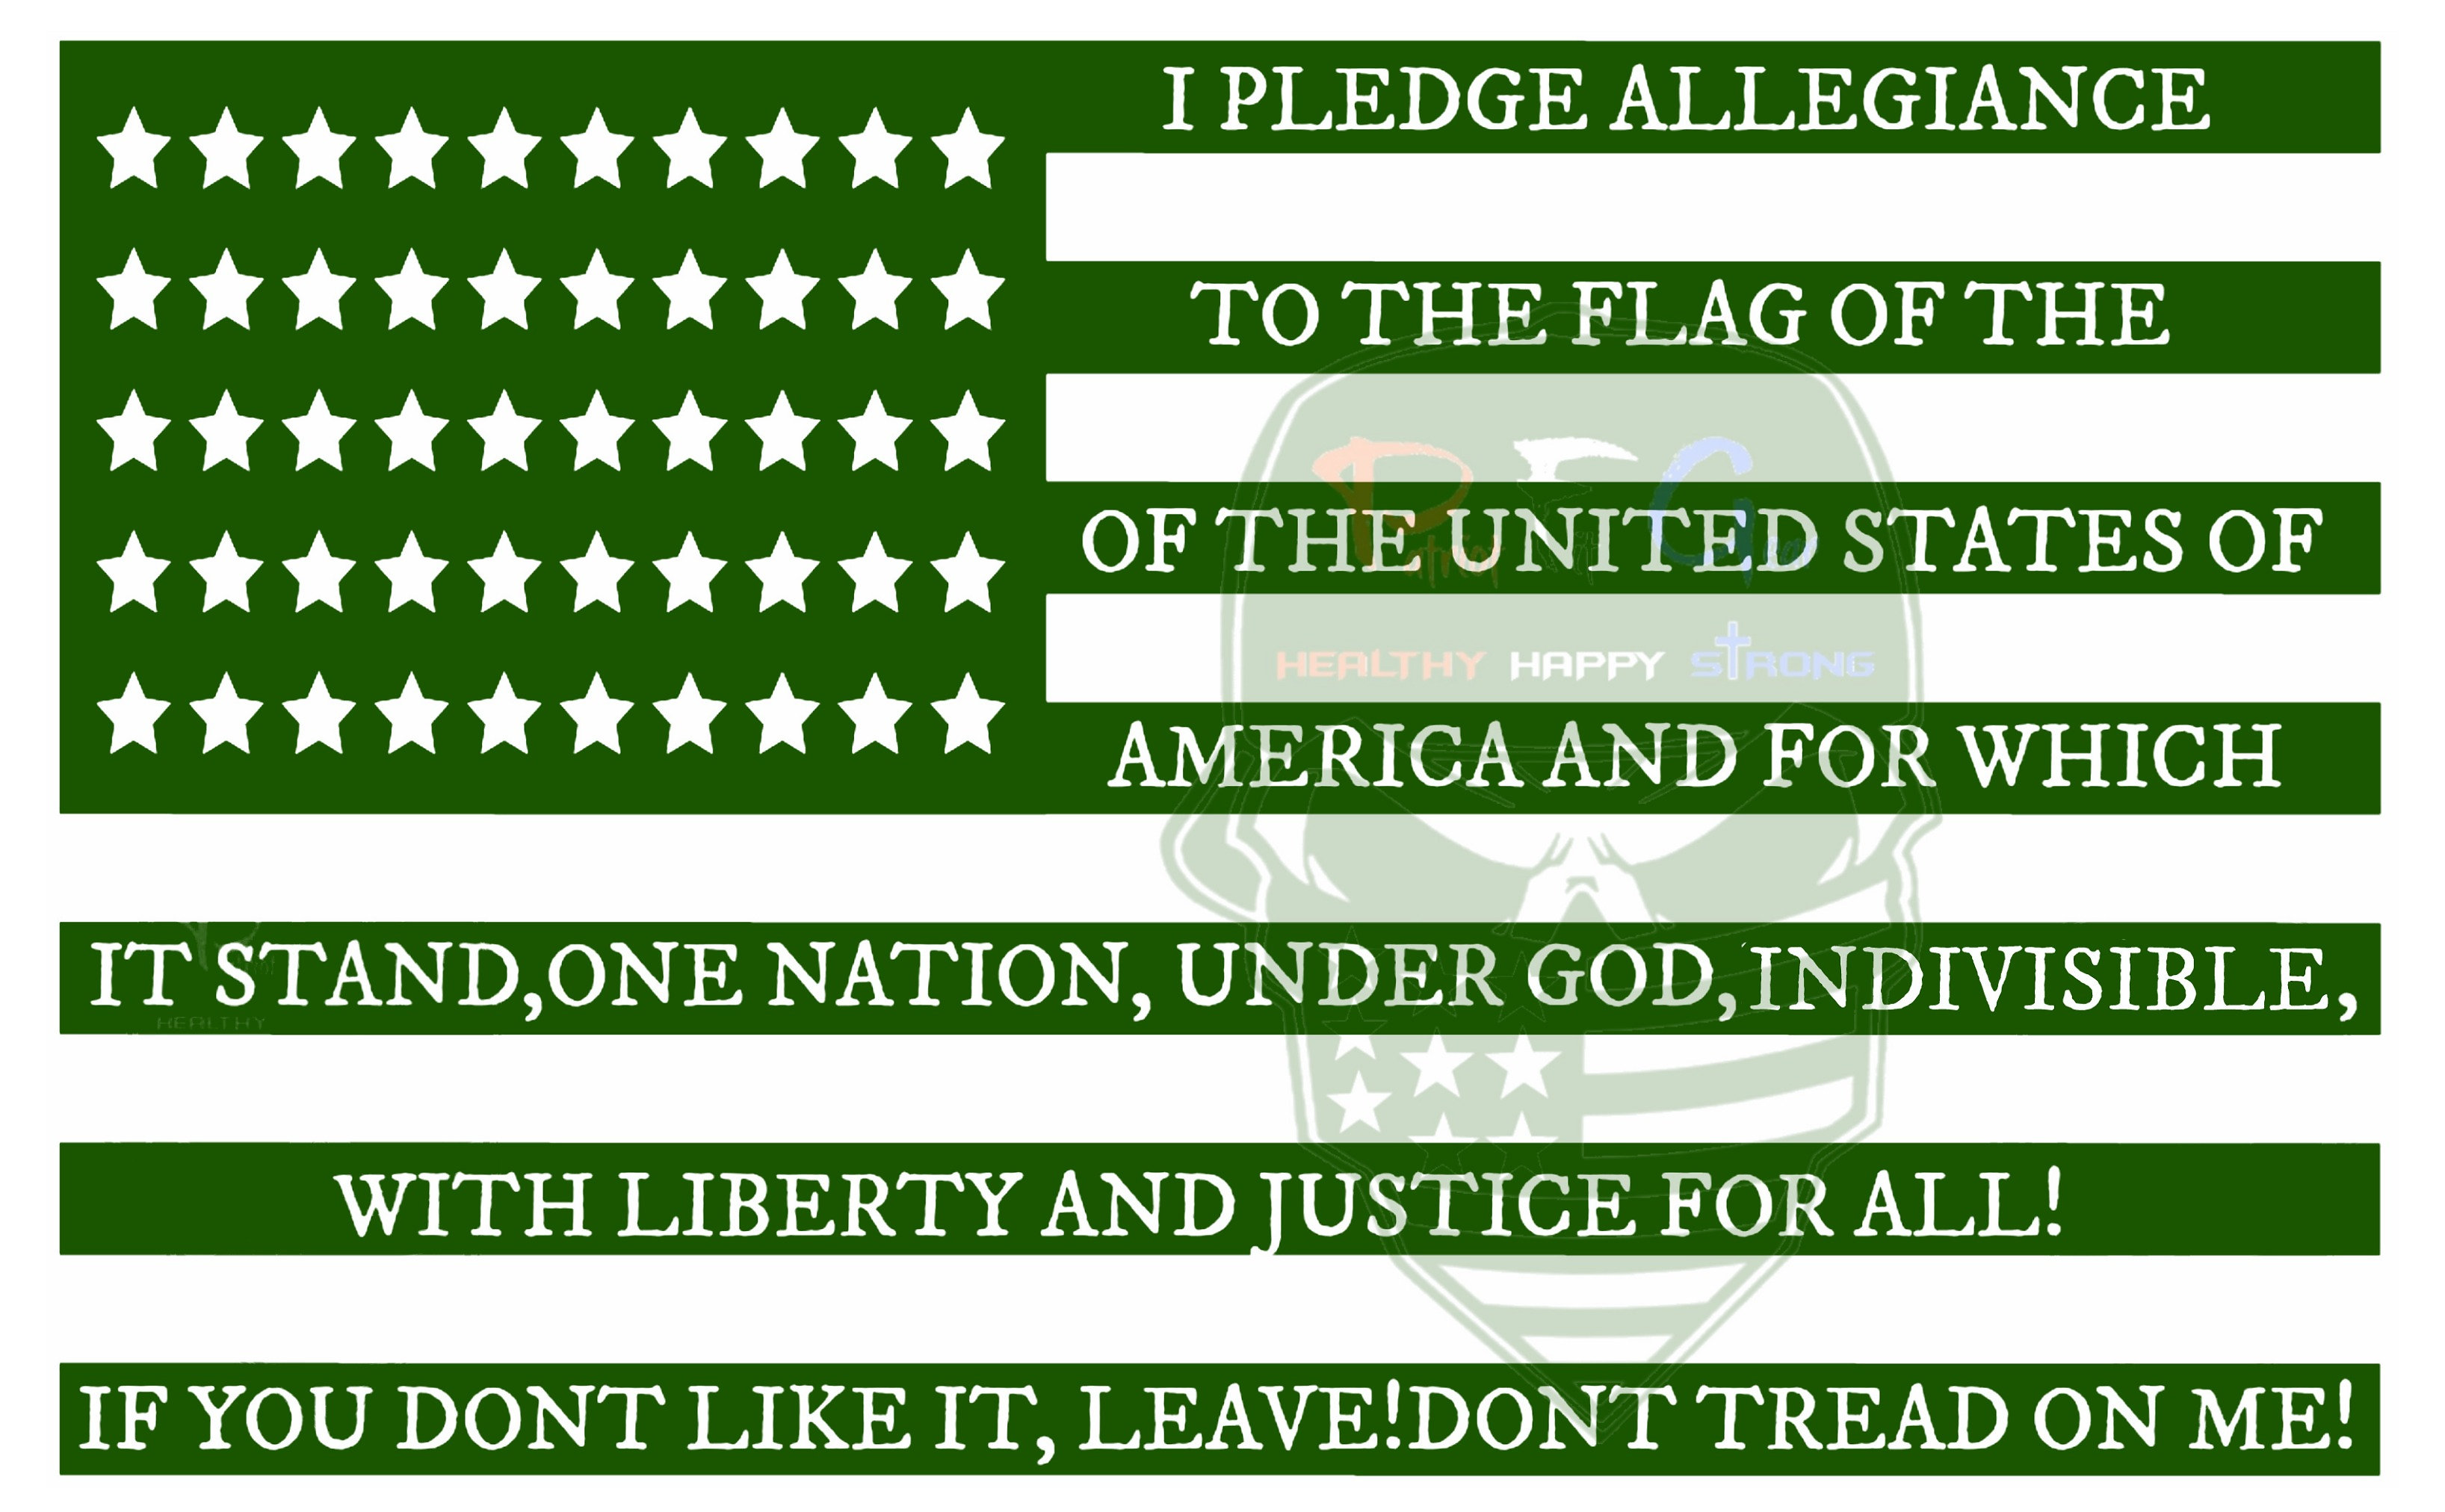 patriotfitgear i pledge allegiance flag dtom 15x8 vinyl decal